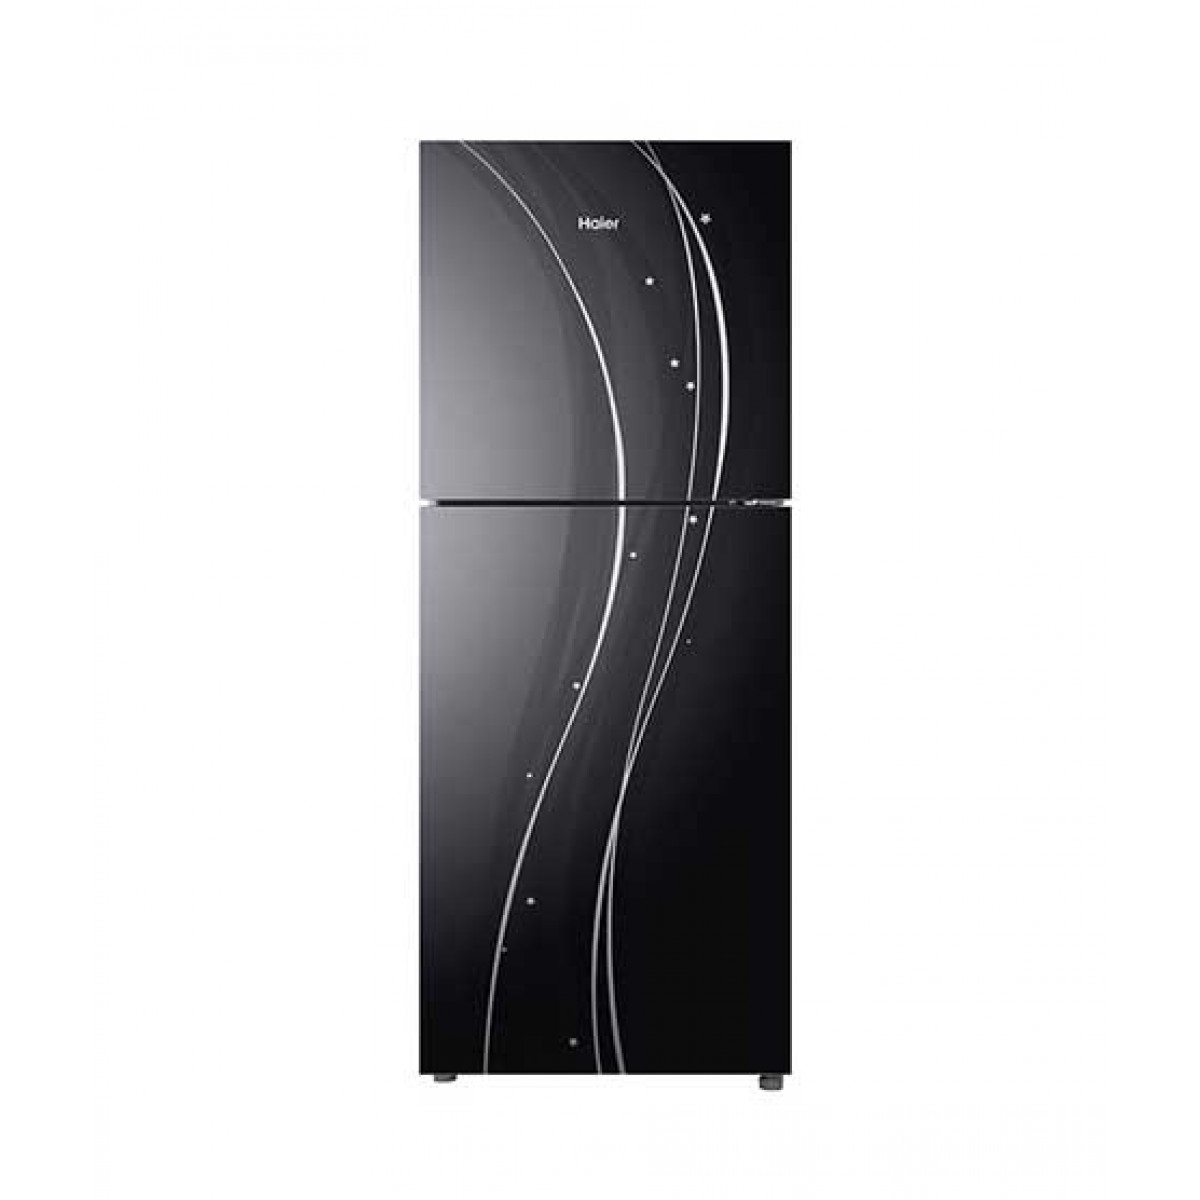 Haier E-Star Freezer-On-Top Refrigerator 7.5 Cu Ft (HRF-246-EPB)